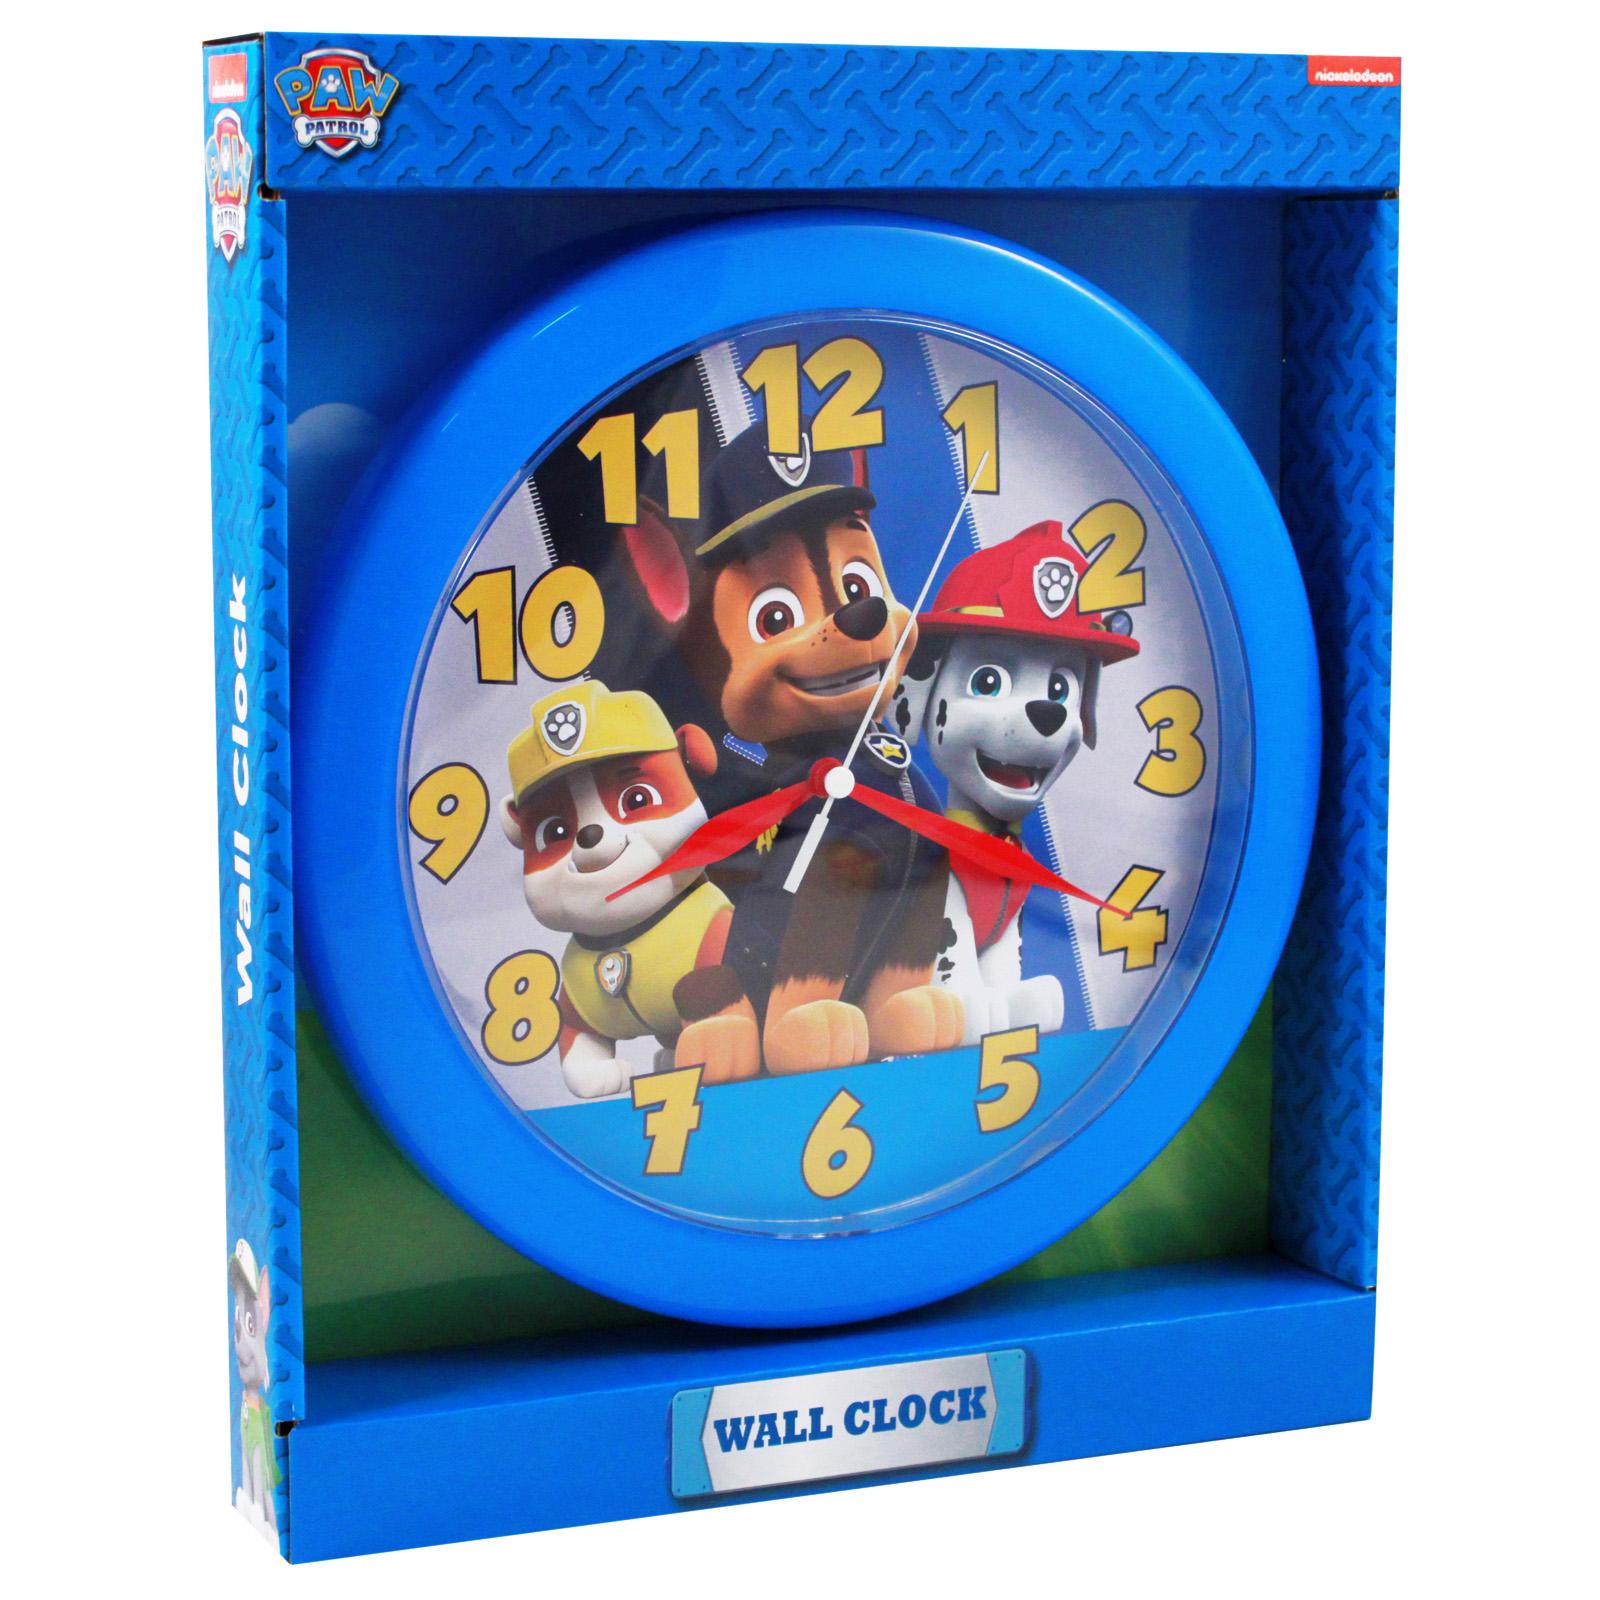 Nickelodeon Paw Patrol Analog Wall Clock Kids Decor 10 inch